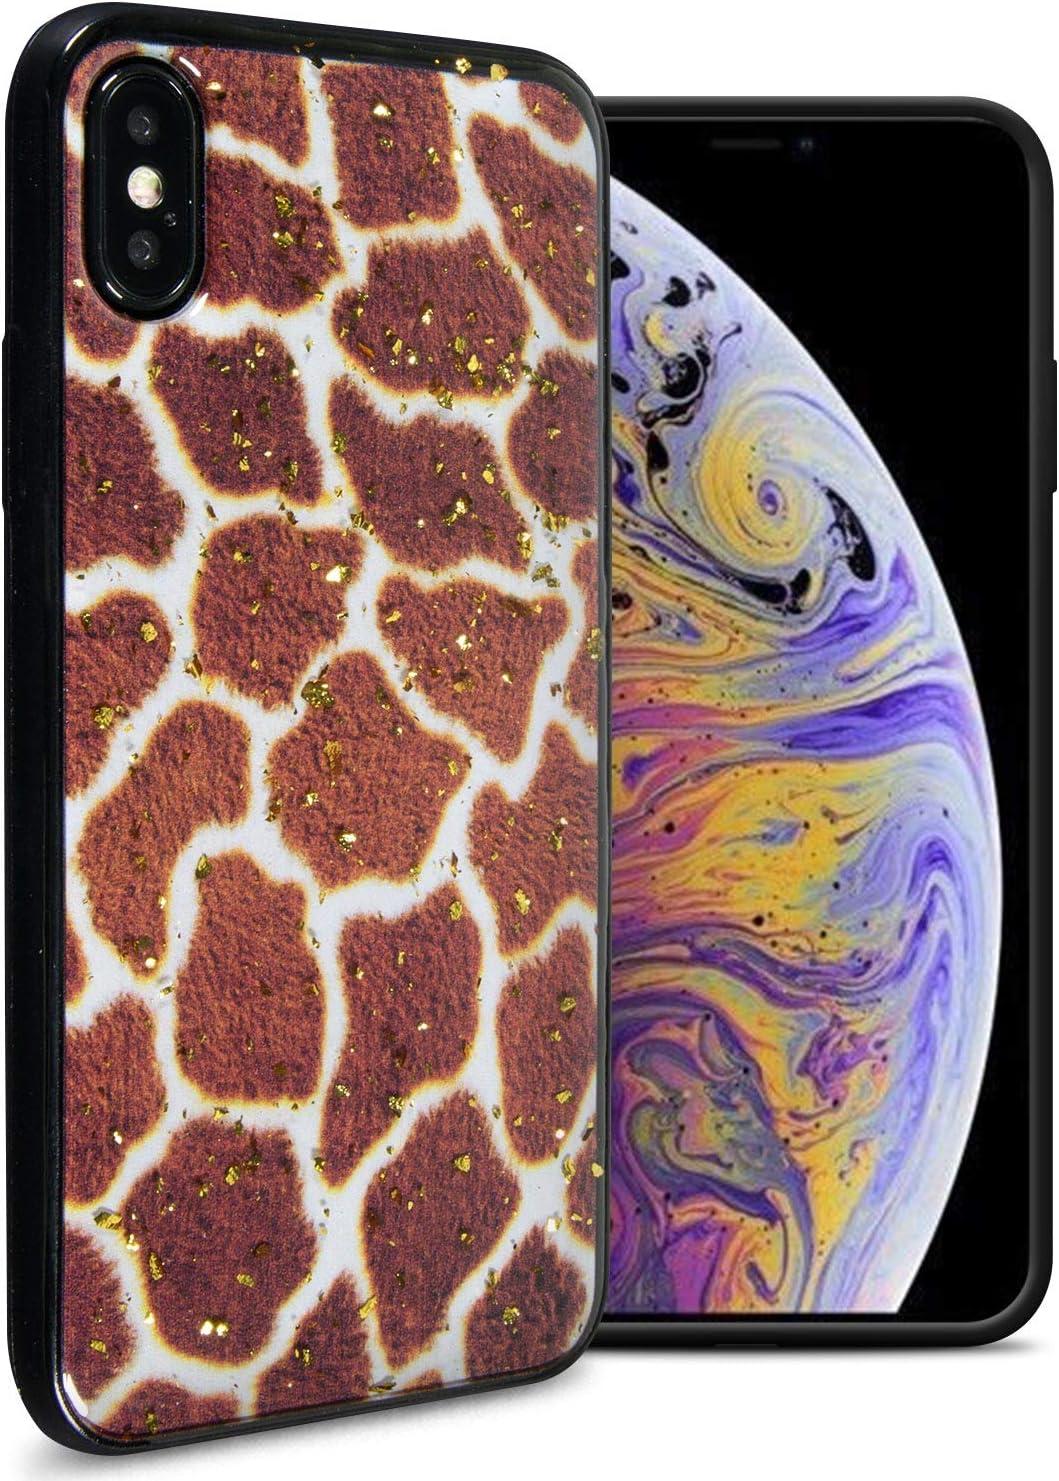 CoverON Slim Glitter TPU Rubber Safari Skin Series for Apple iPhone Xs/iPhone X Case, Giraffe Print